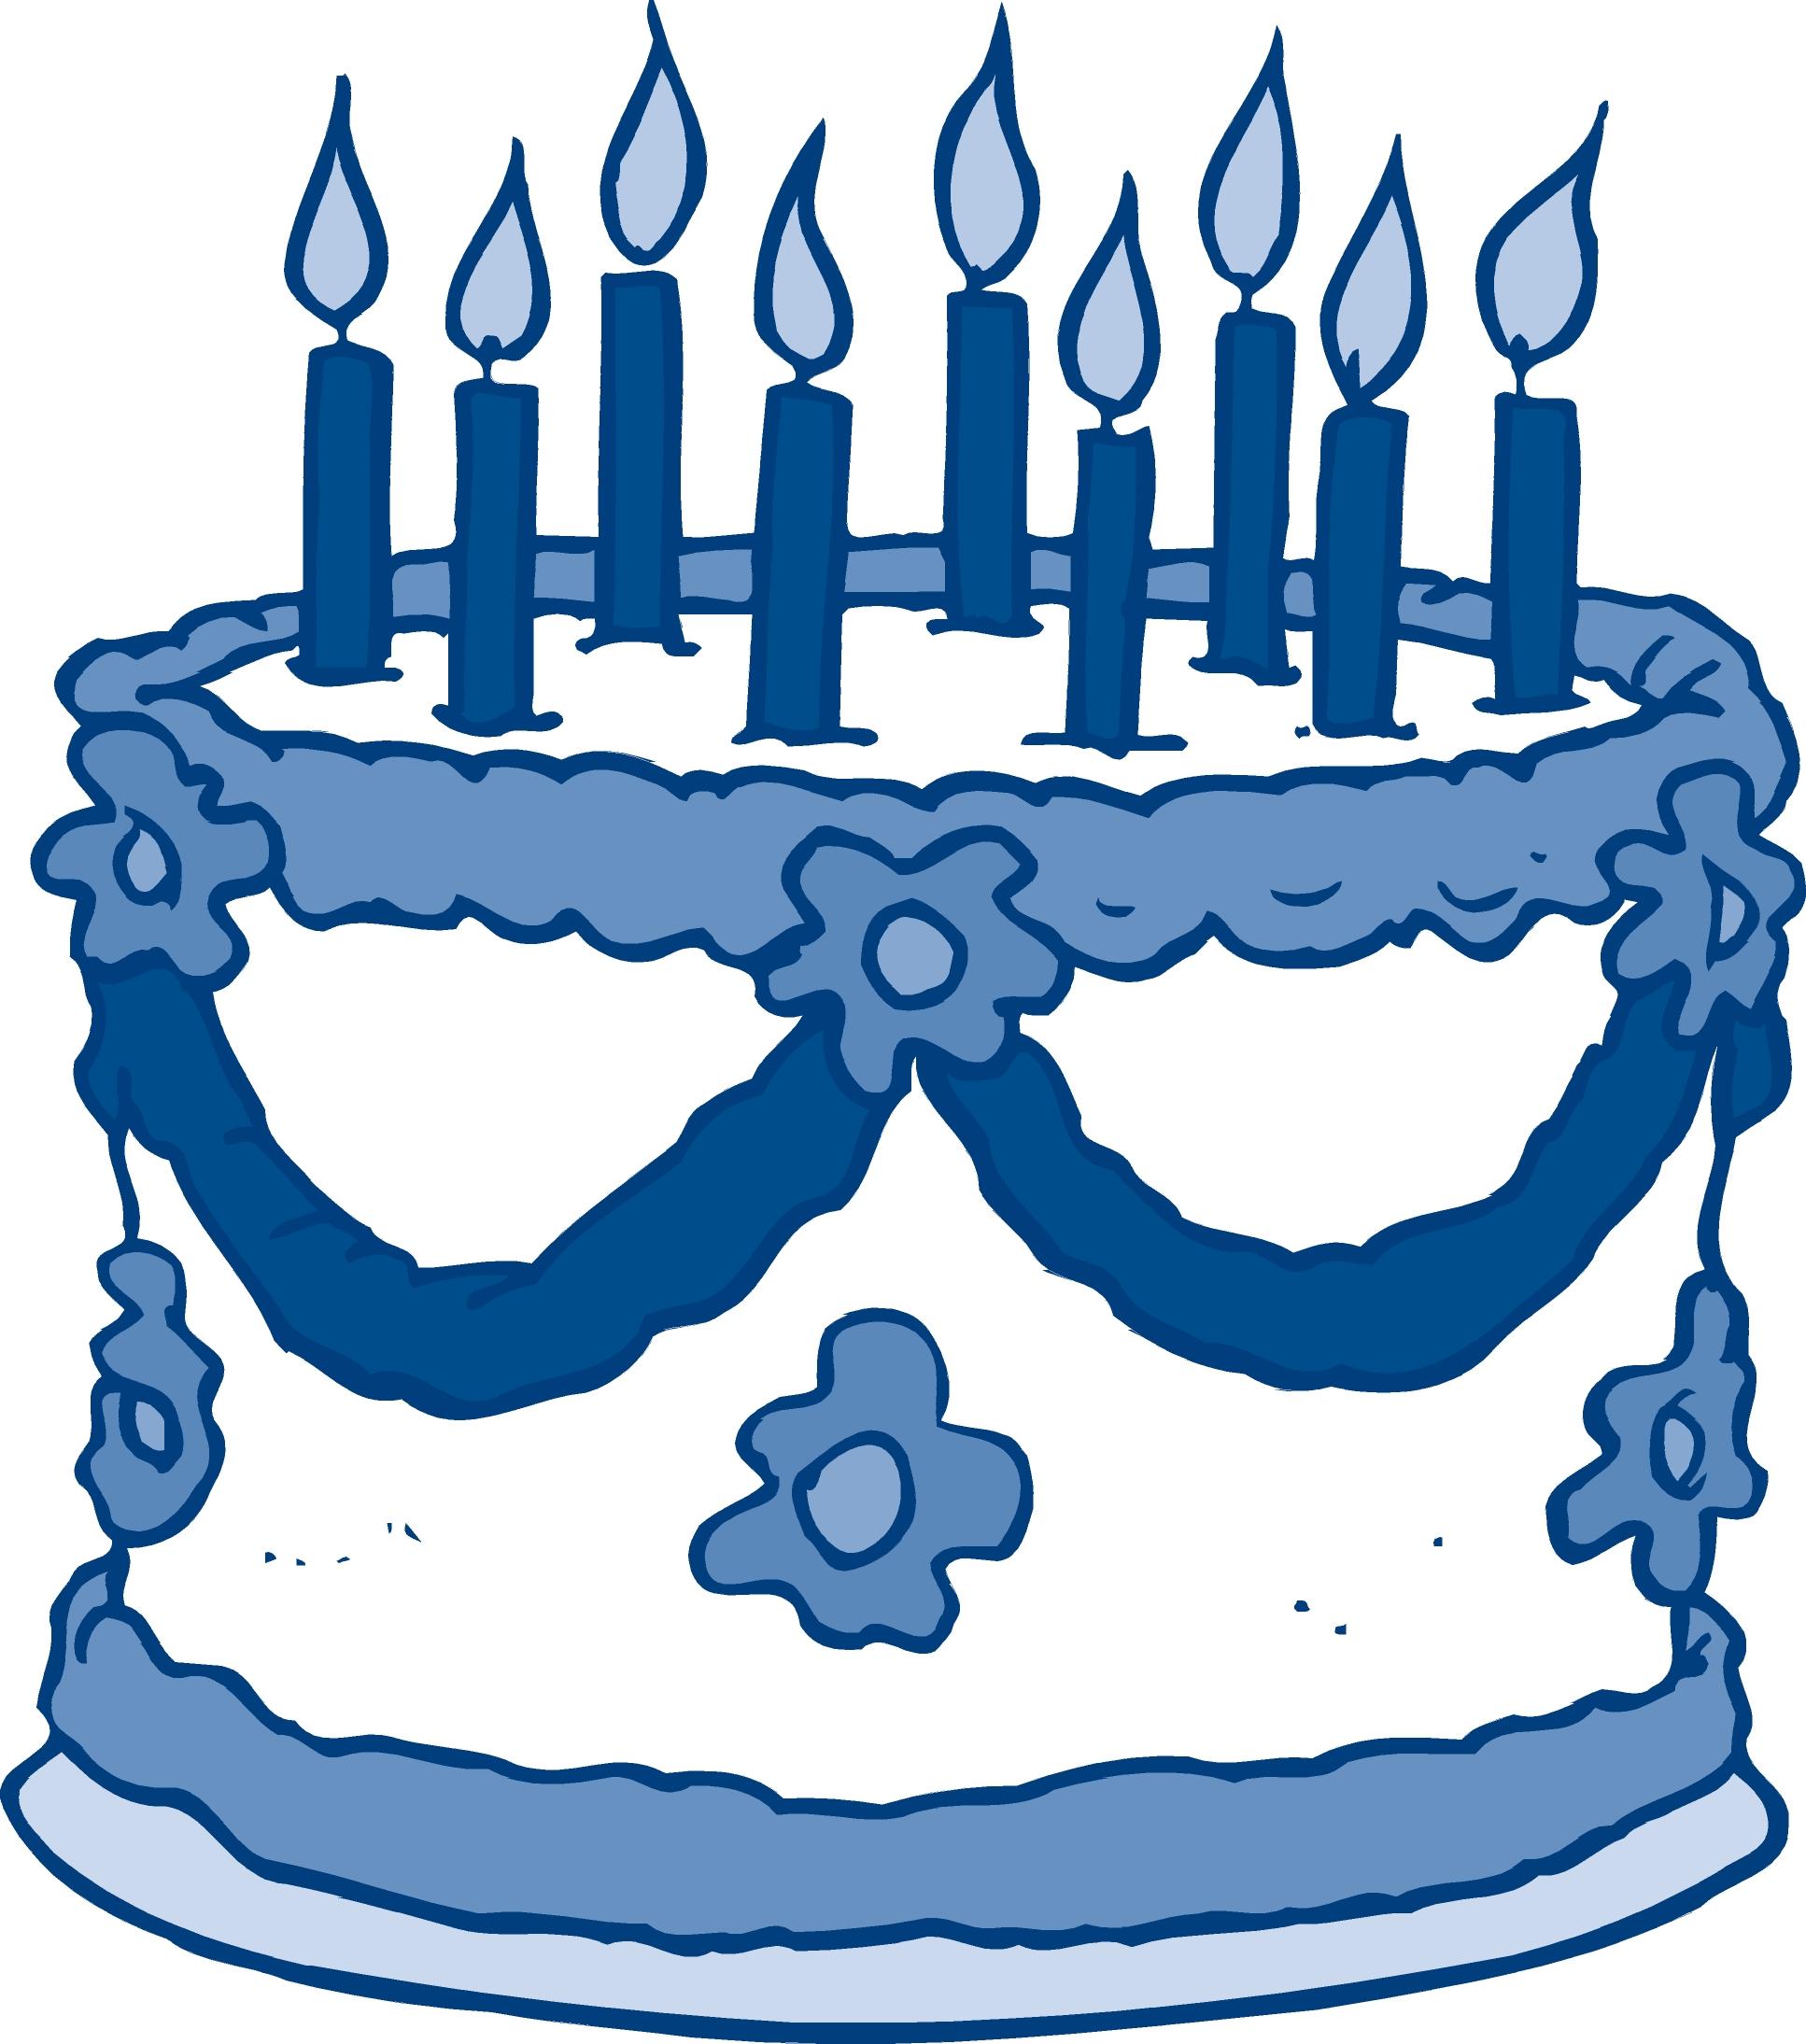 Blue clipart birthday cake, Blue birthday cake Transparent.